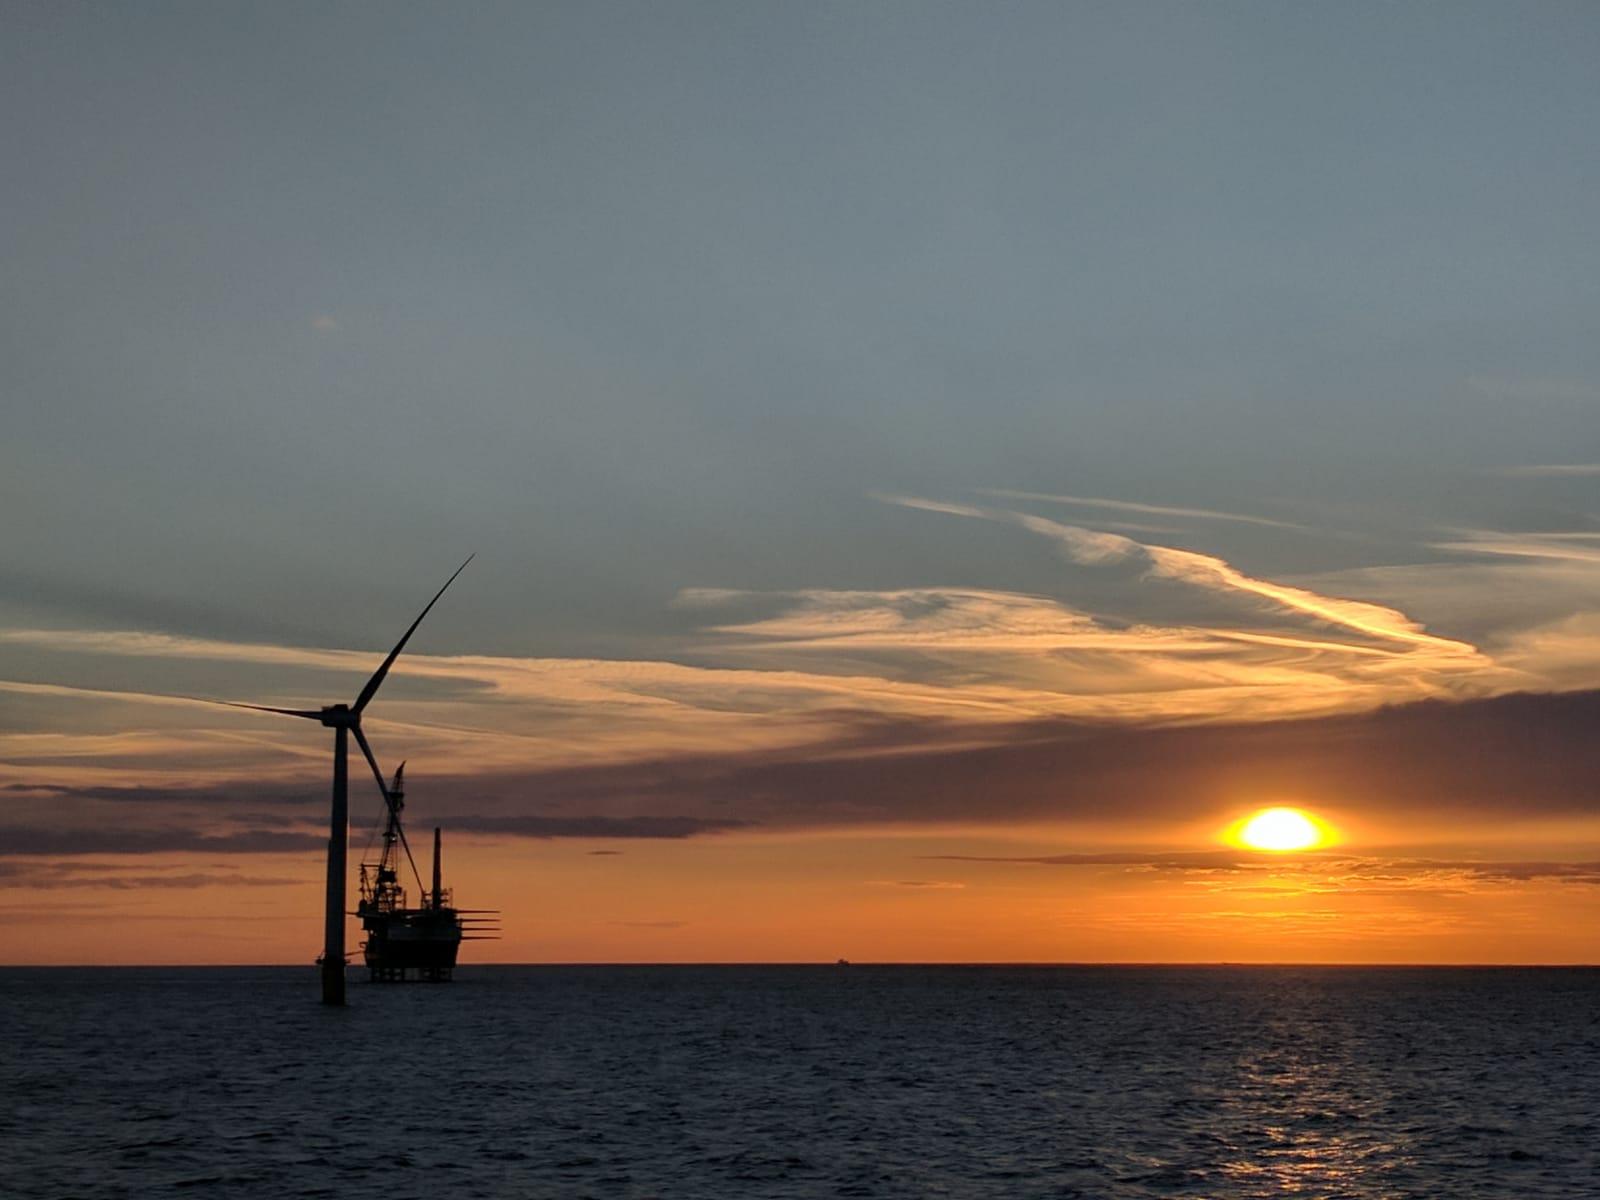 RIG-Systems-Devon-Meldon-Safety-Training-Access-Rescue-GWO-Global-Wind-Organisation-Winda-Wind-Turbine-Sunset-1